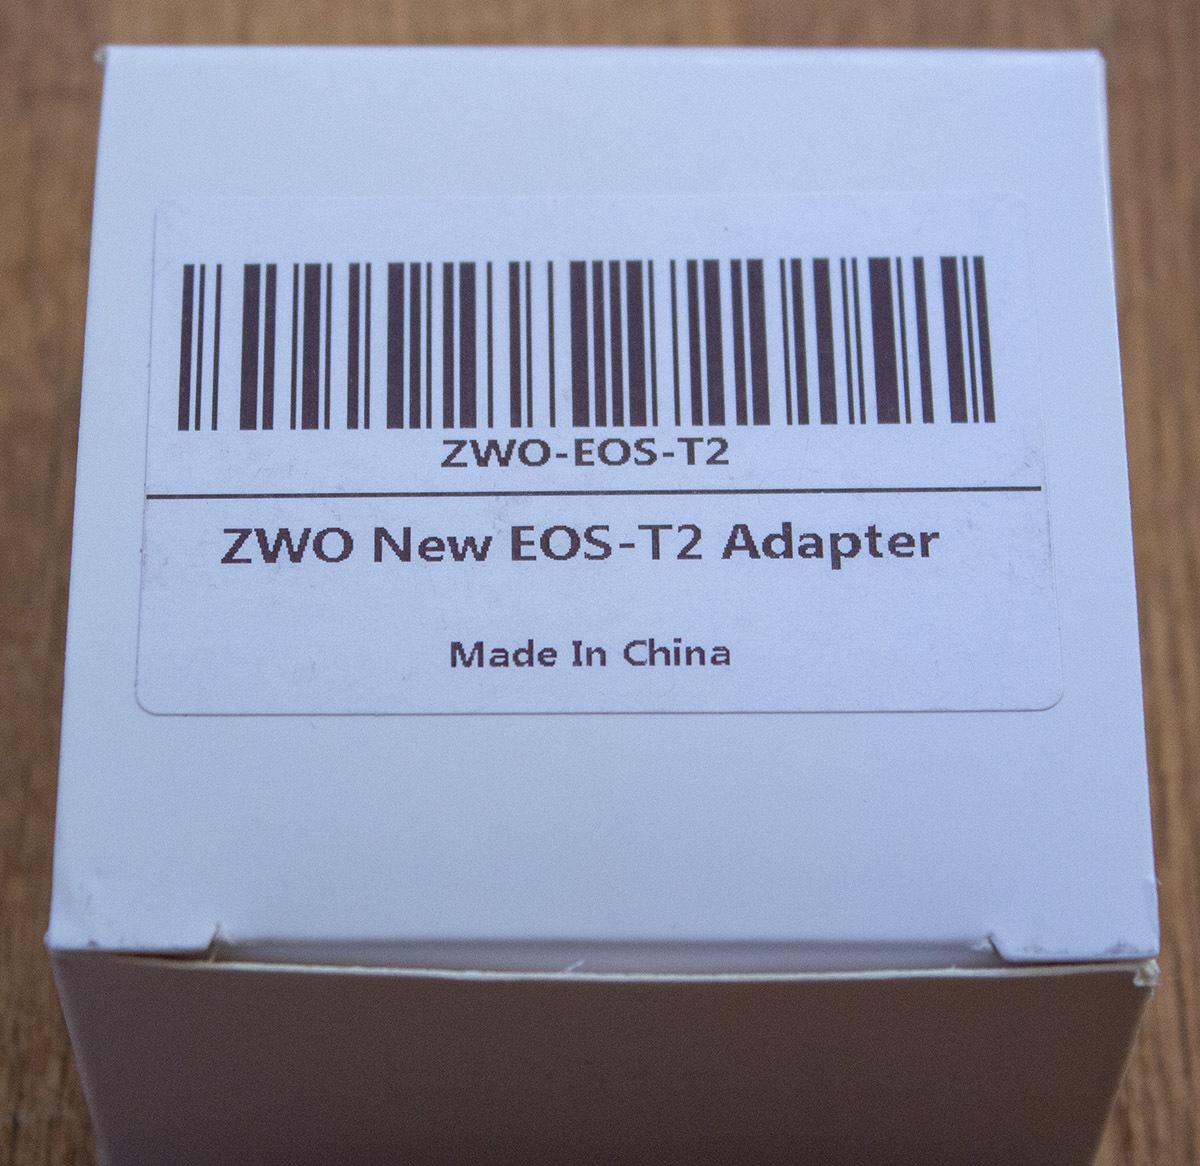 ASI294MC PRO 到着 開封しました_e0174091_15441680.jpg